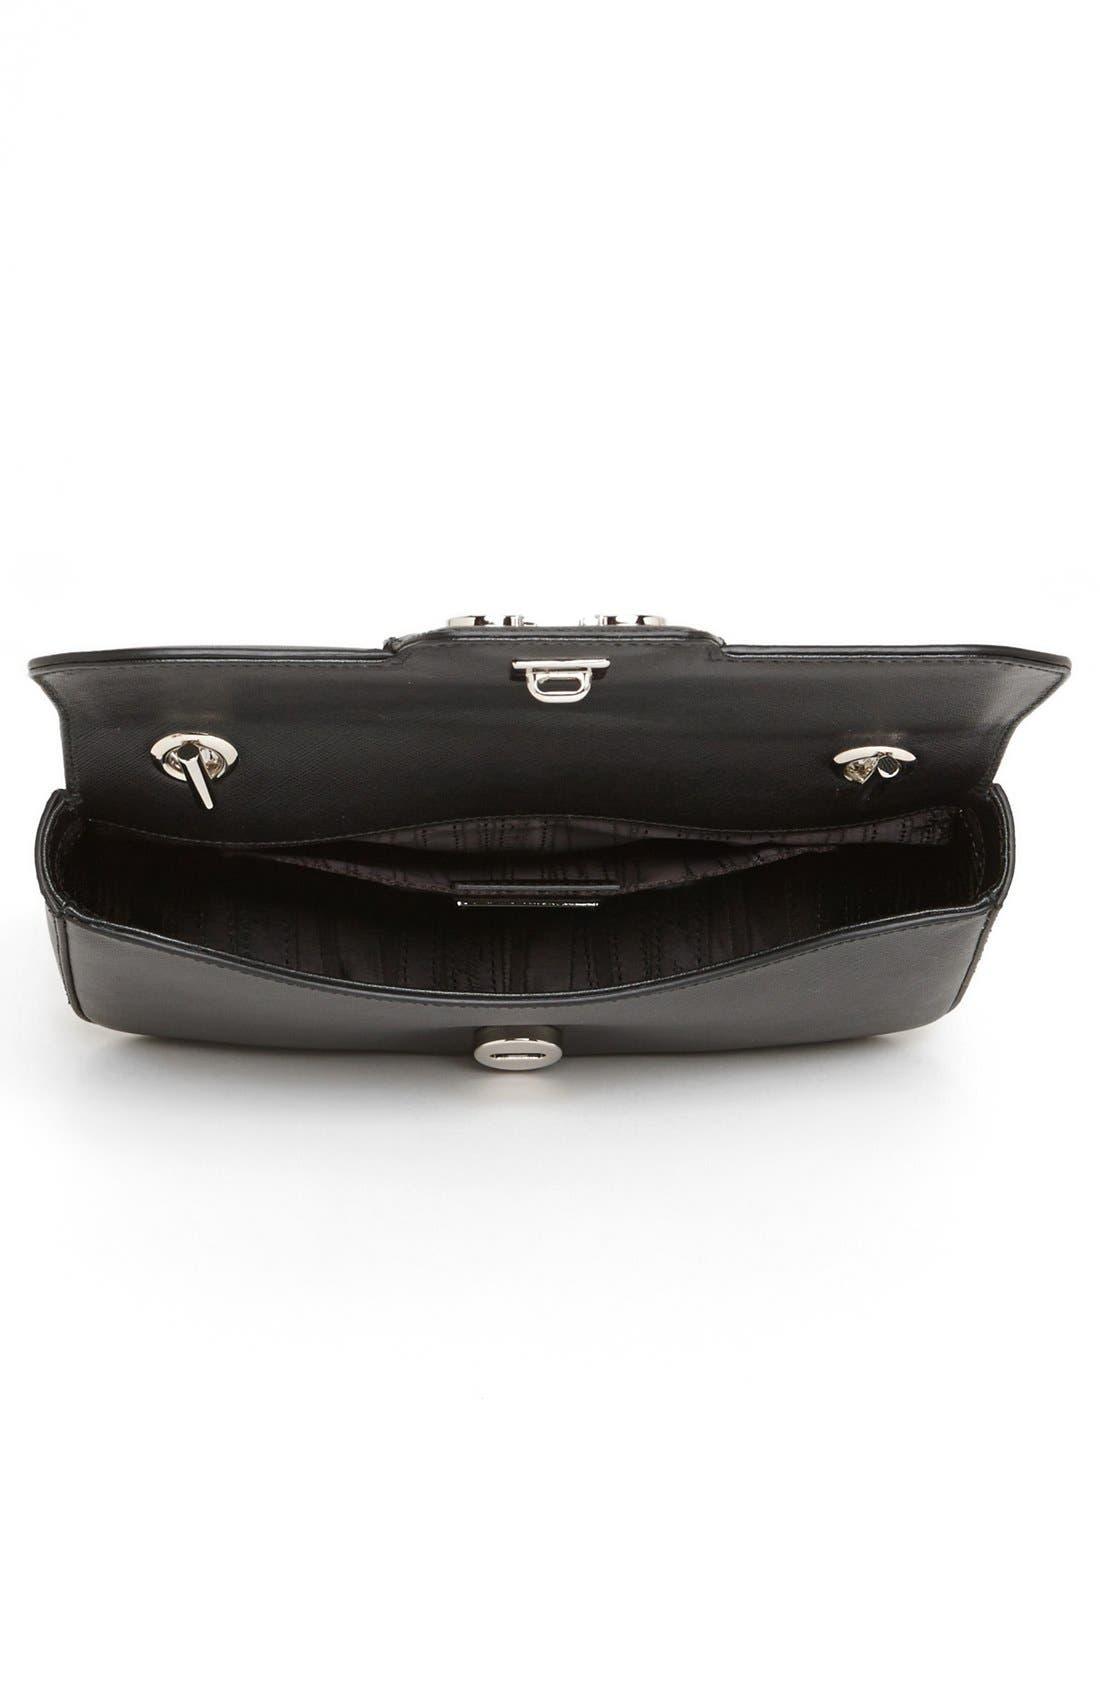 Alternate Image 3  - Salvatore Ferragamo 'Rory' Leather Shoulder Bag